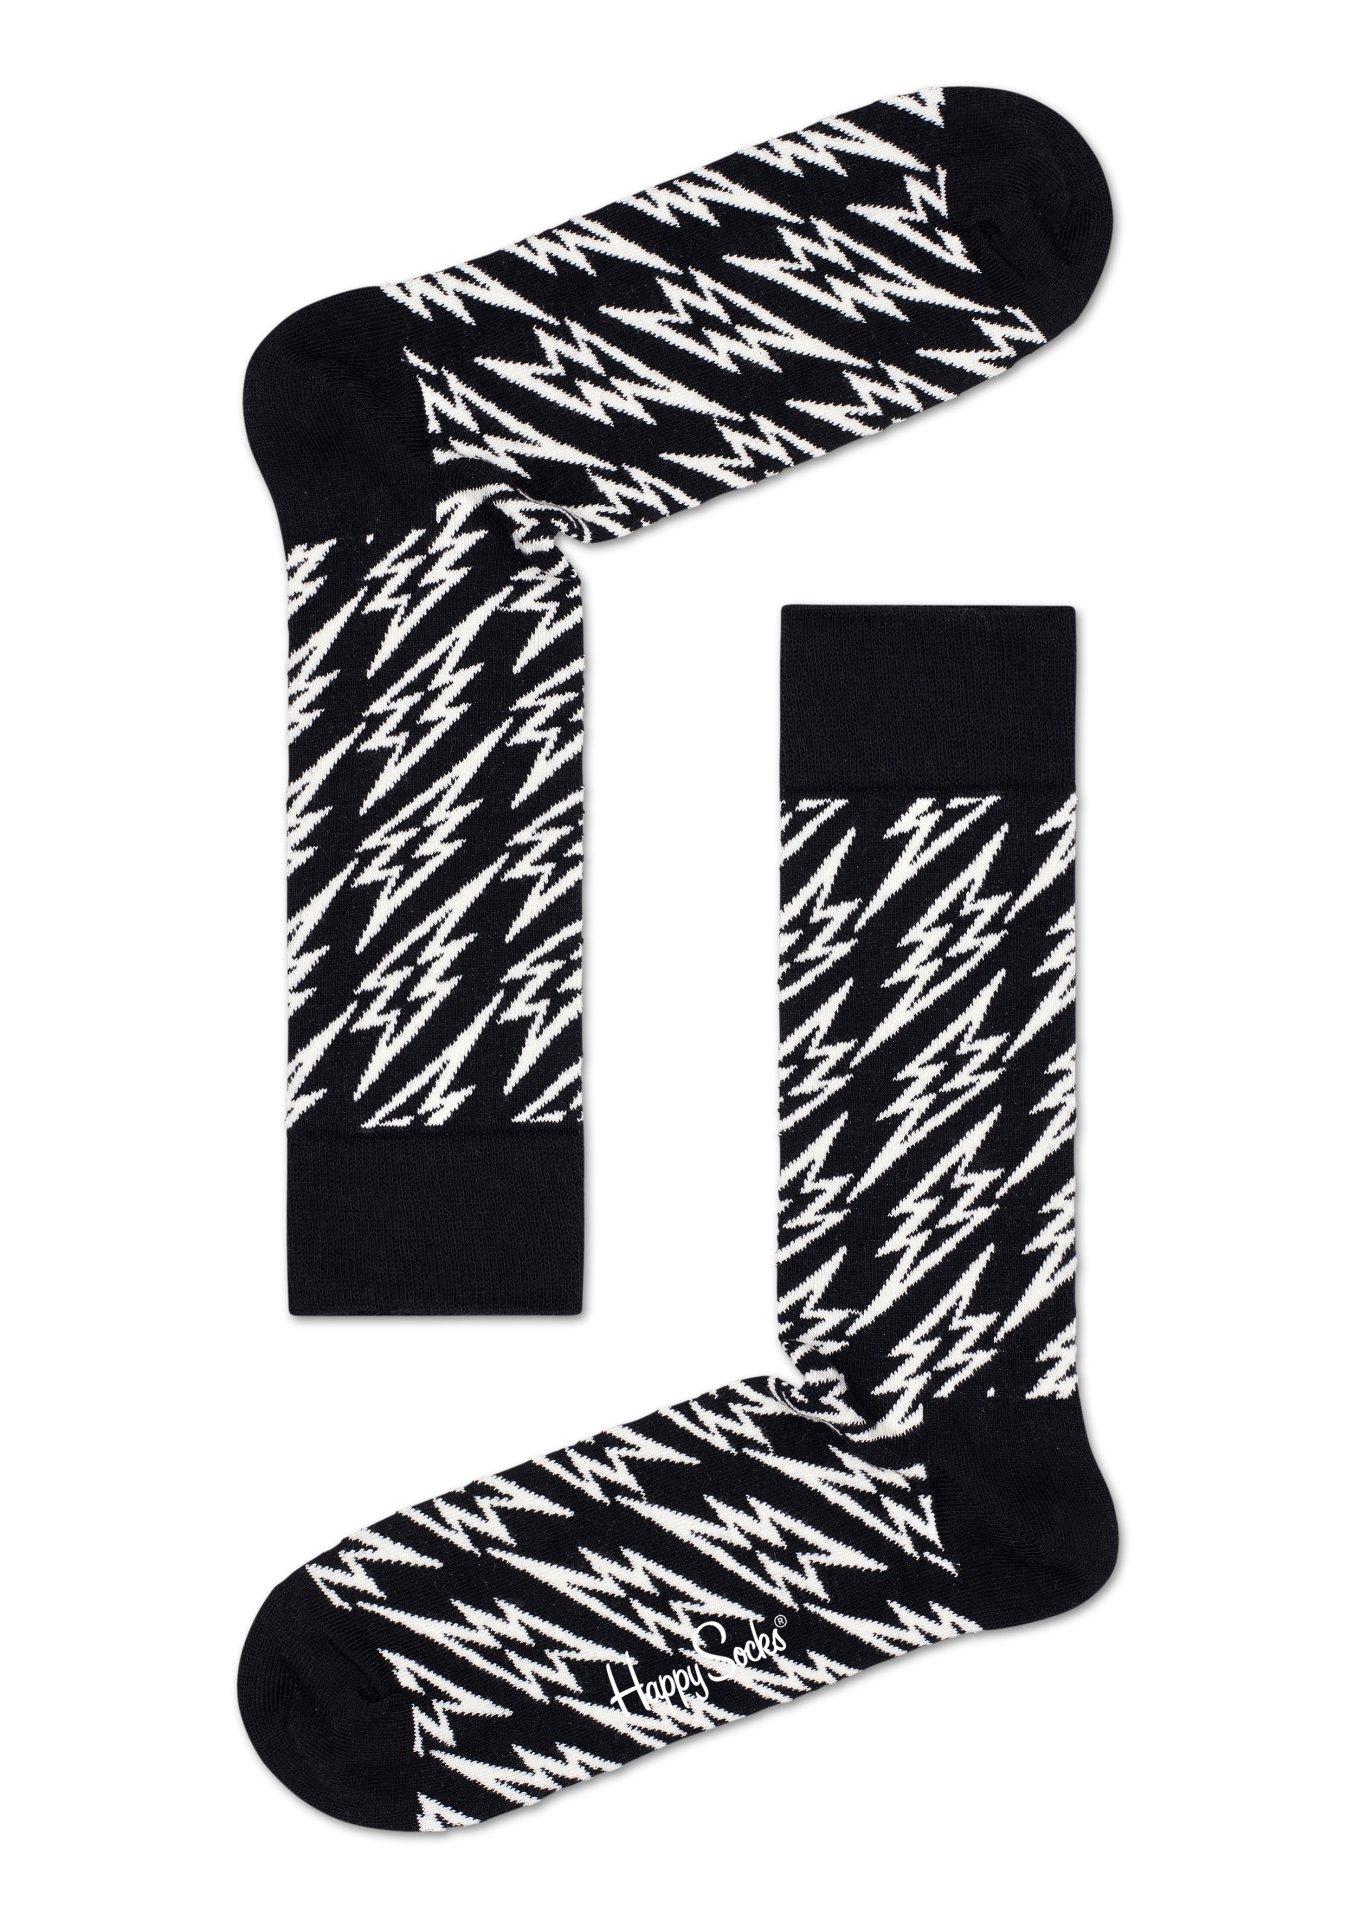 Happy Socks Flash Lightning 1 paar kousen 36-40